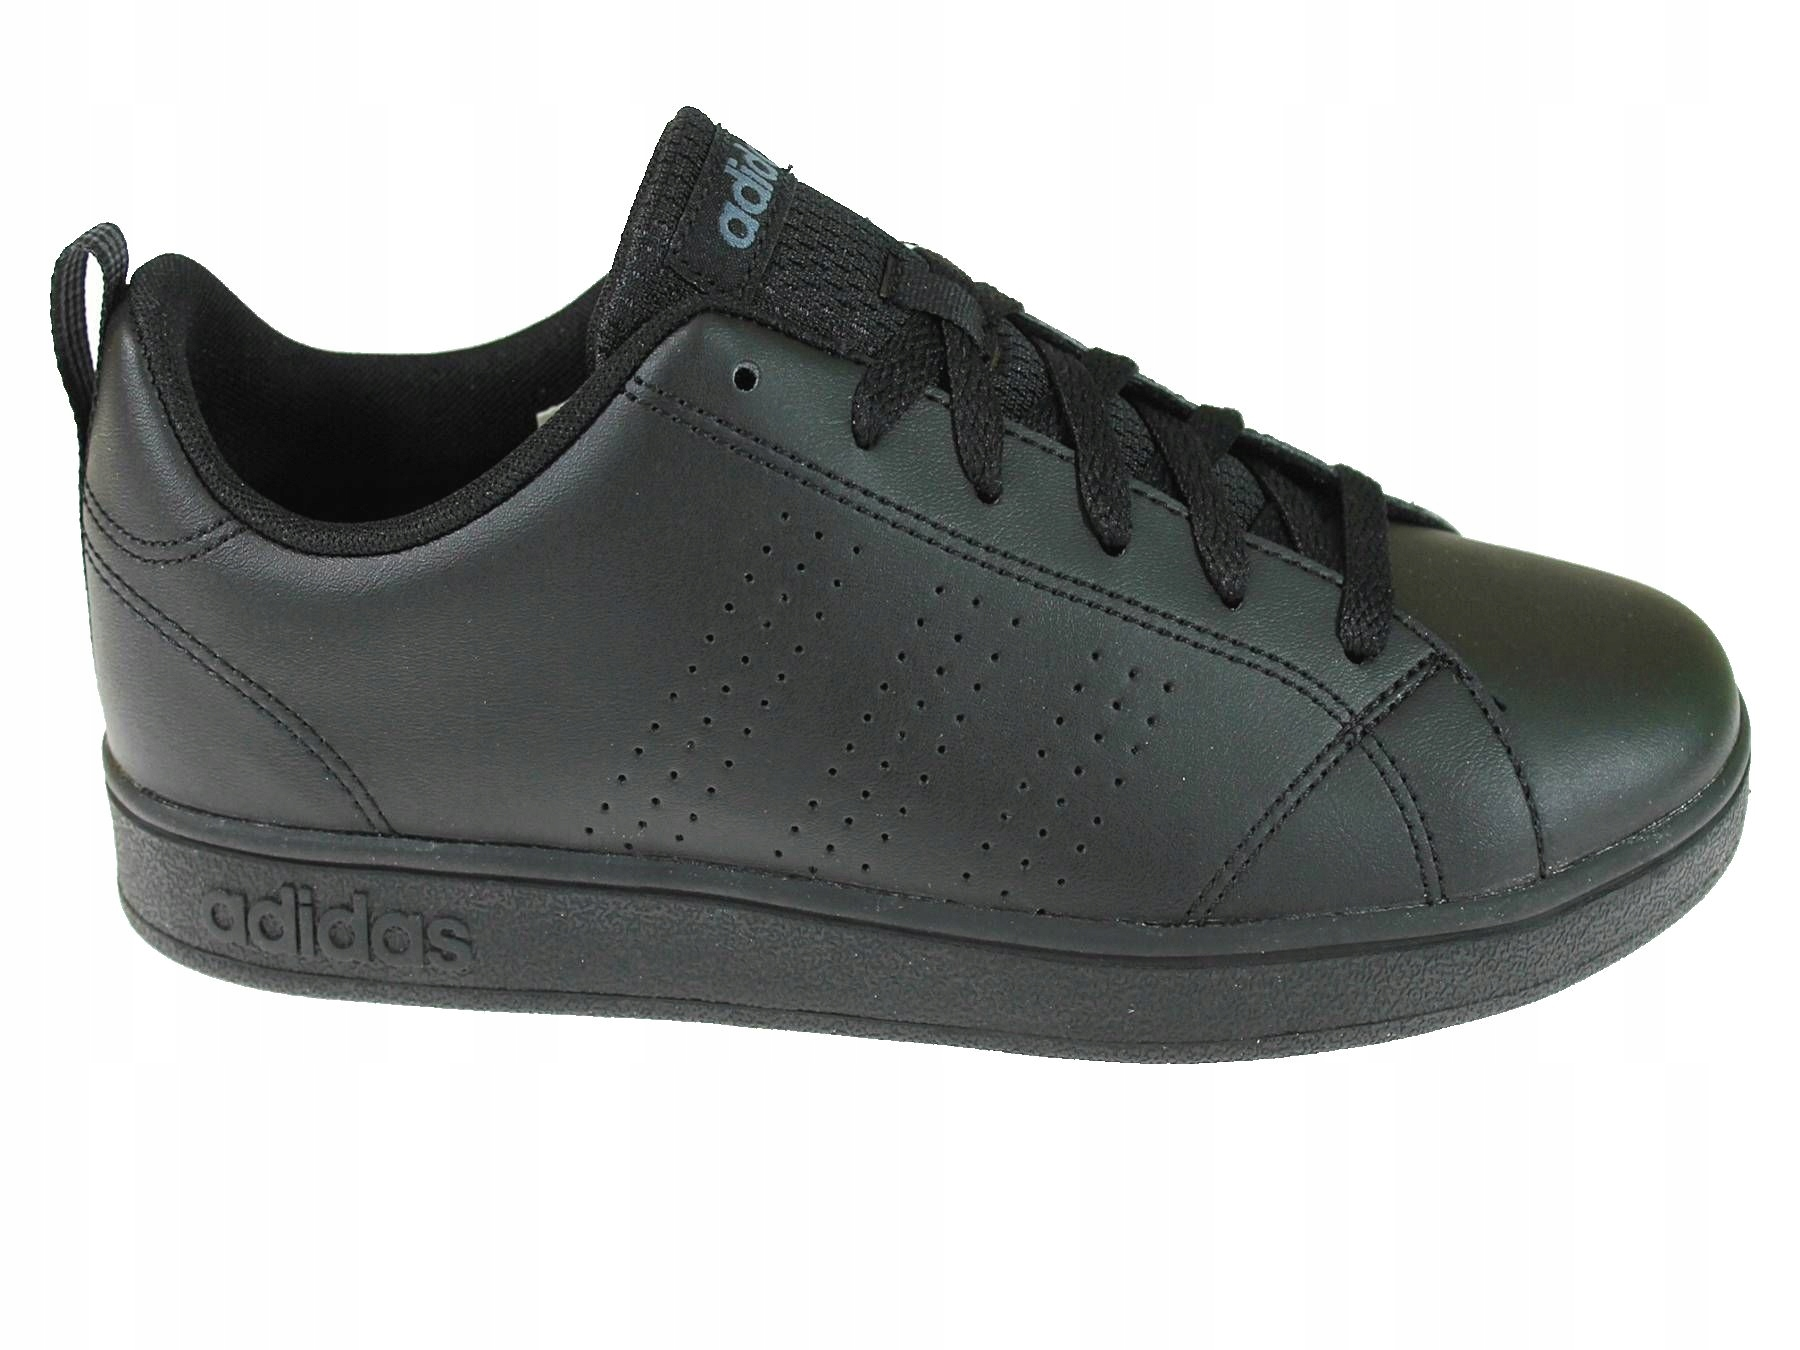 1ff4ddac3e5e4 adidas Advantage Clean AW4883 buty rozmiar 38 - 7158581776 ...